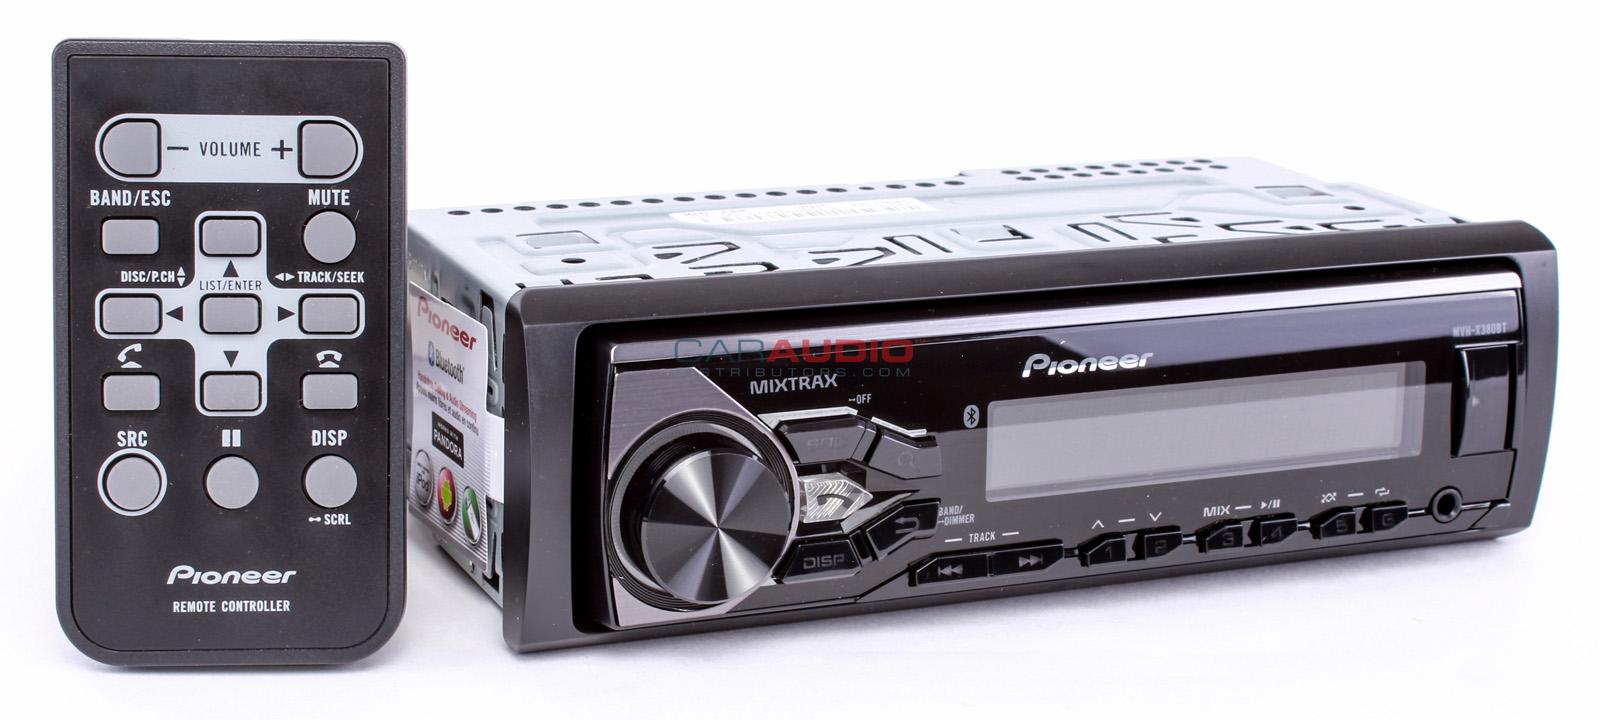 mvh x380bt 1_1 new pioneer mvh x380bt single din digital media car stereo Pioneer MVH X380bt Bluetooth at honlapkeszites.co